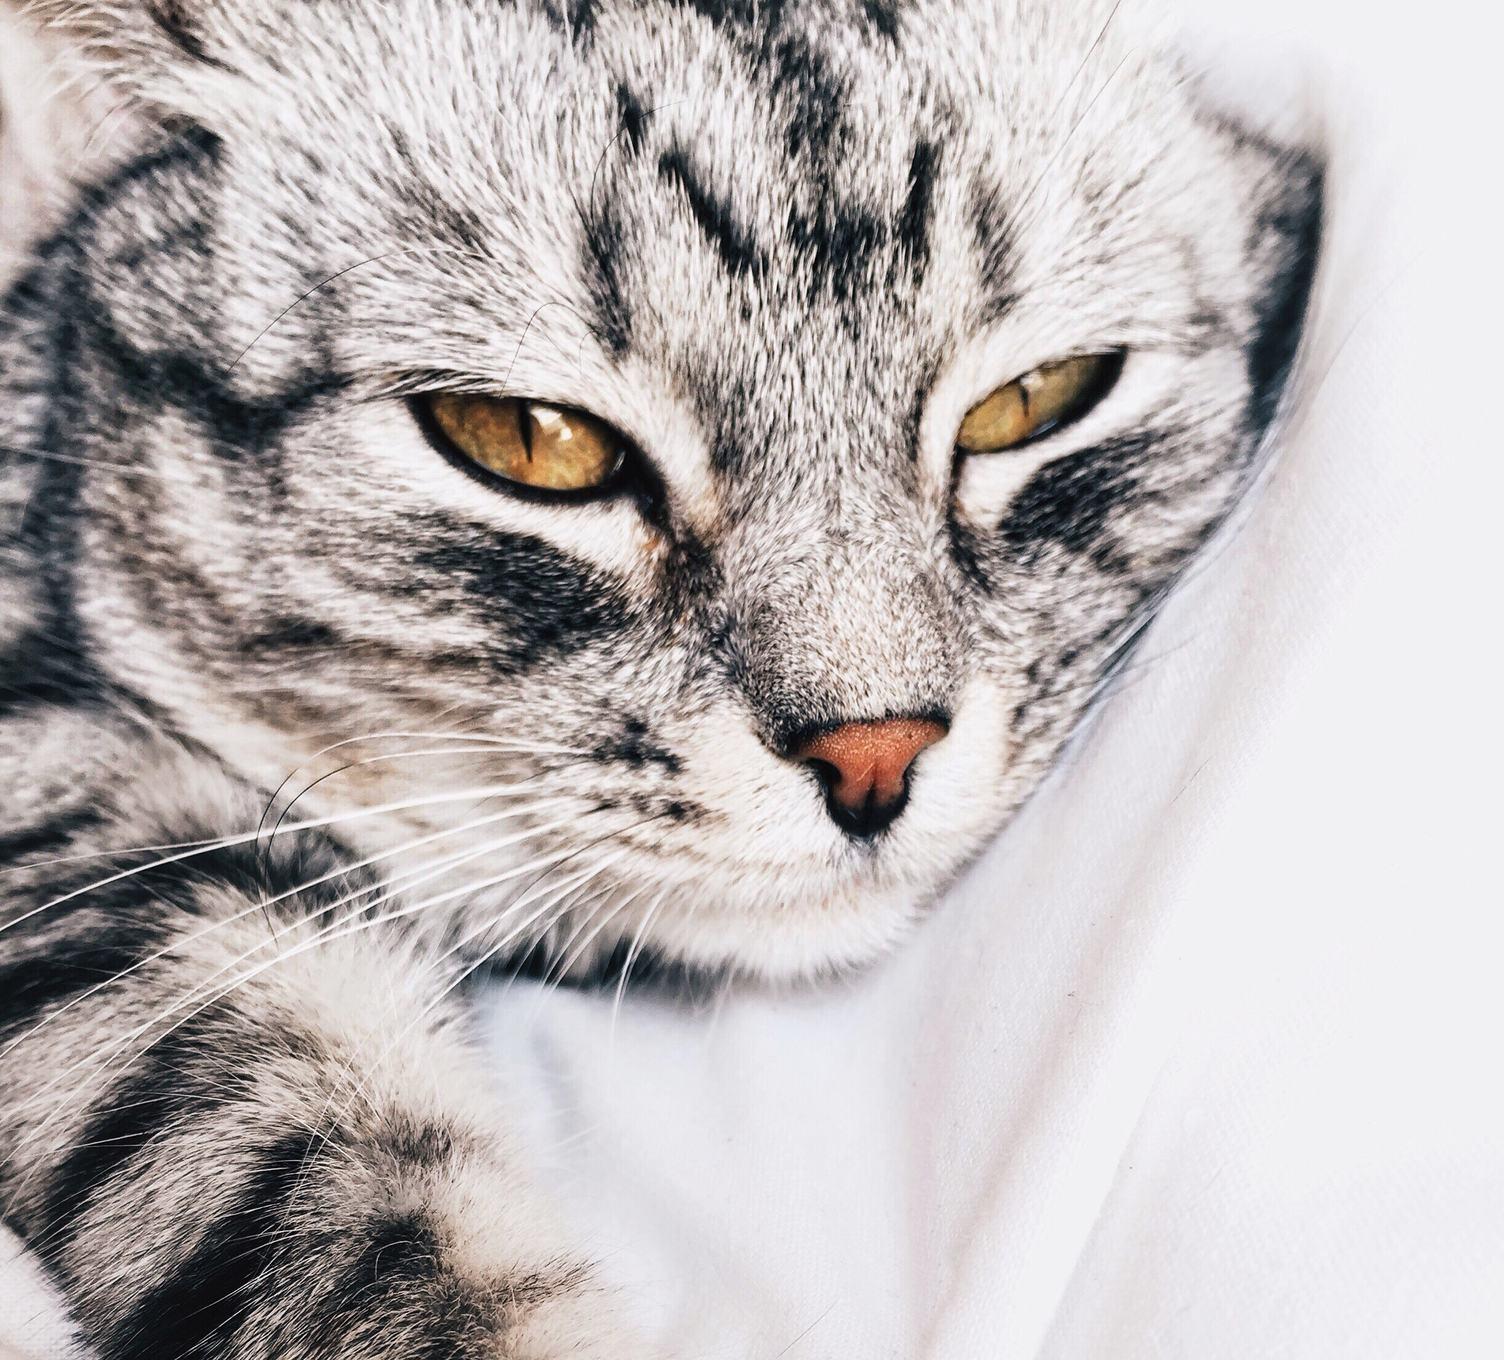 Sweet Animal - Cat Face Portrait